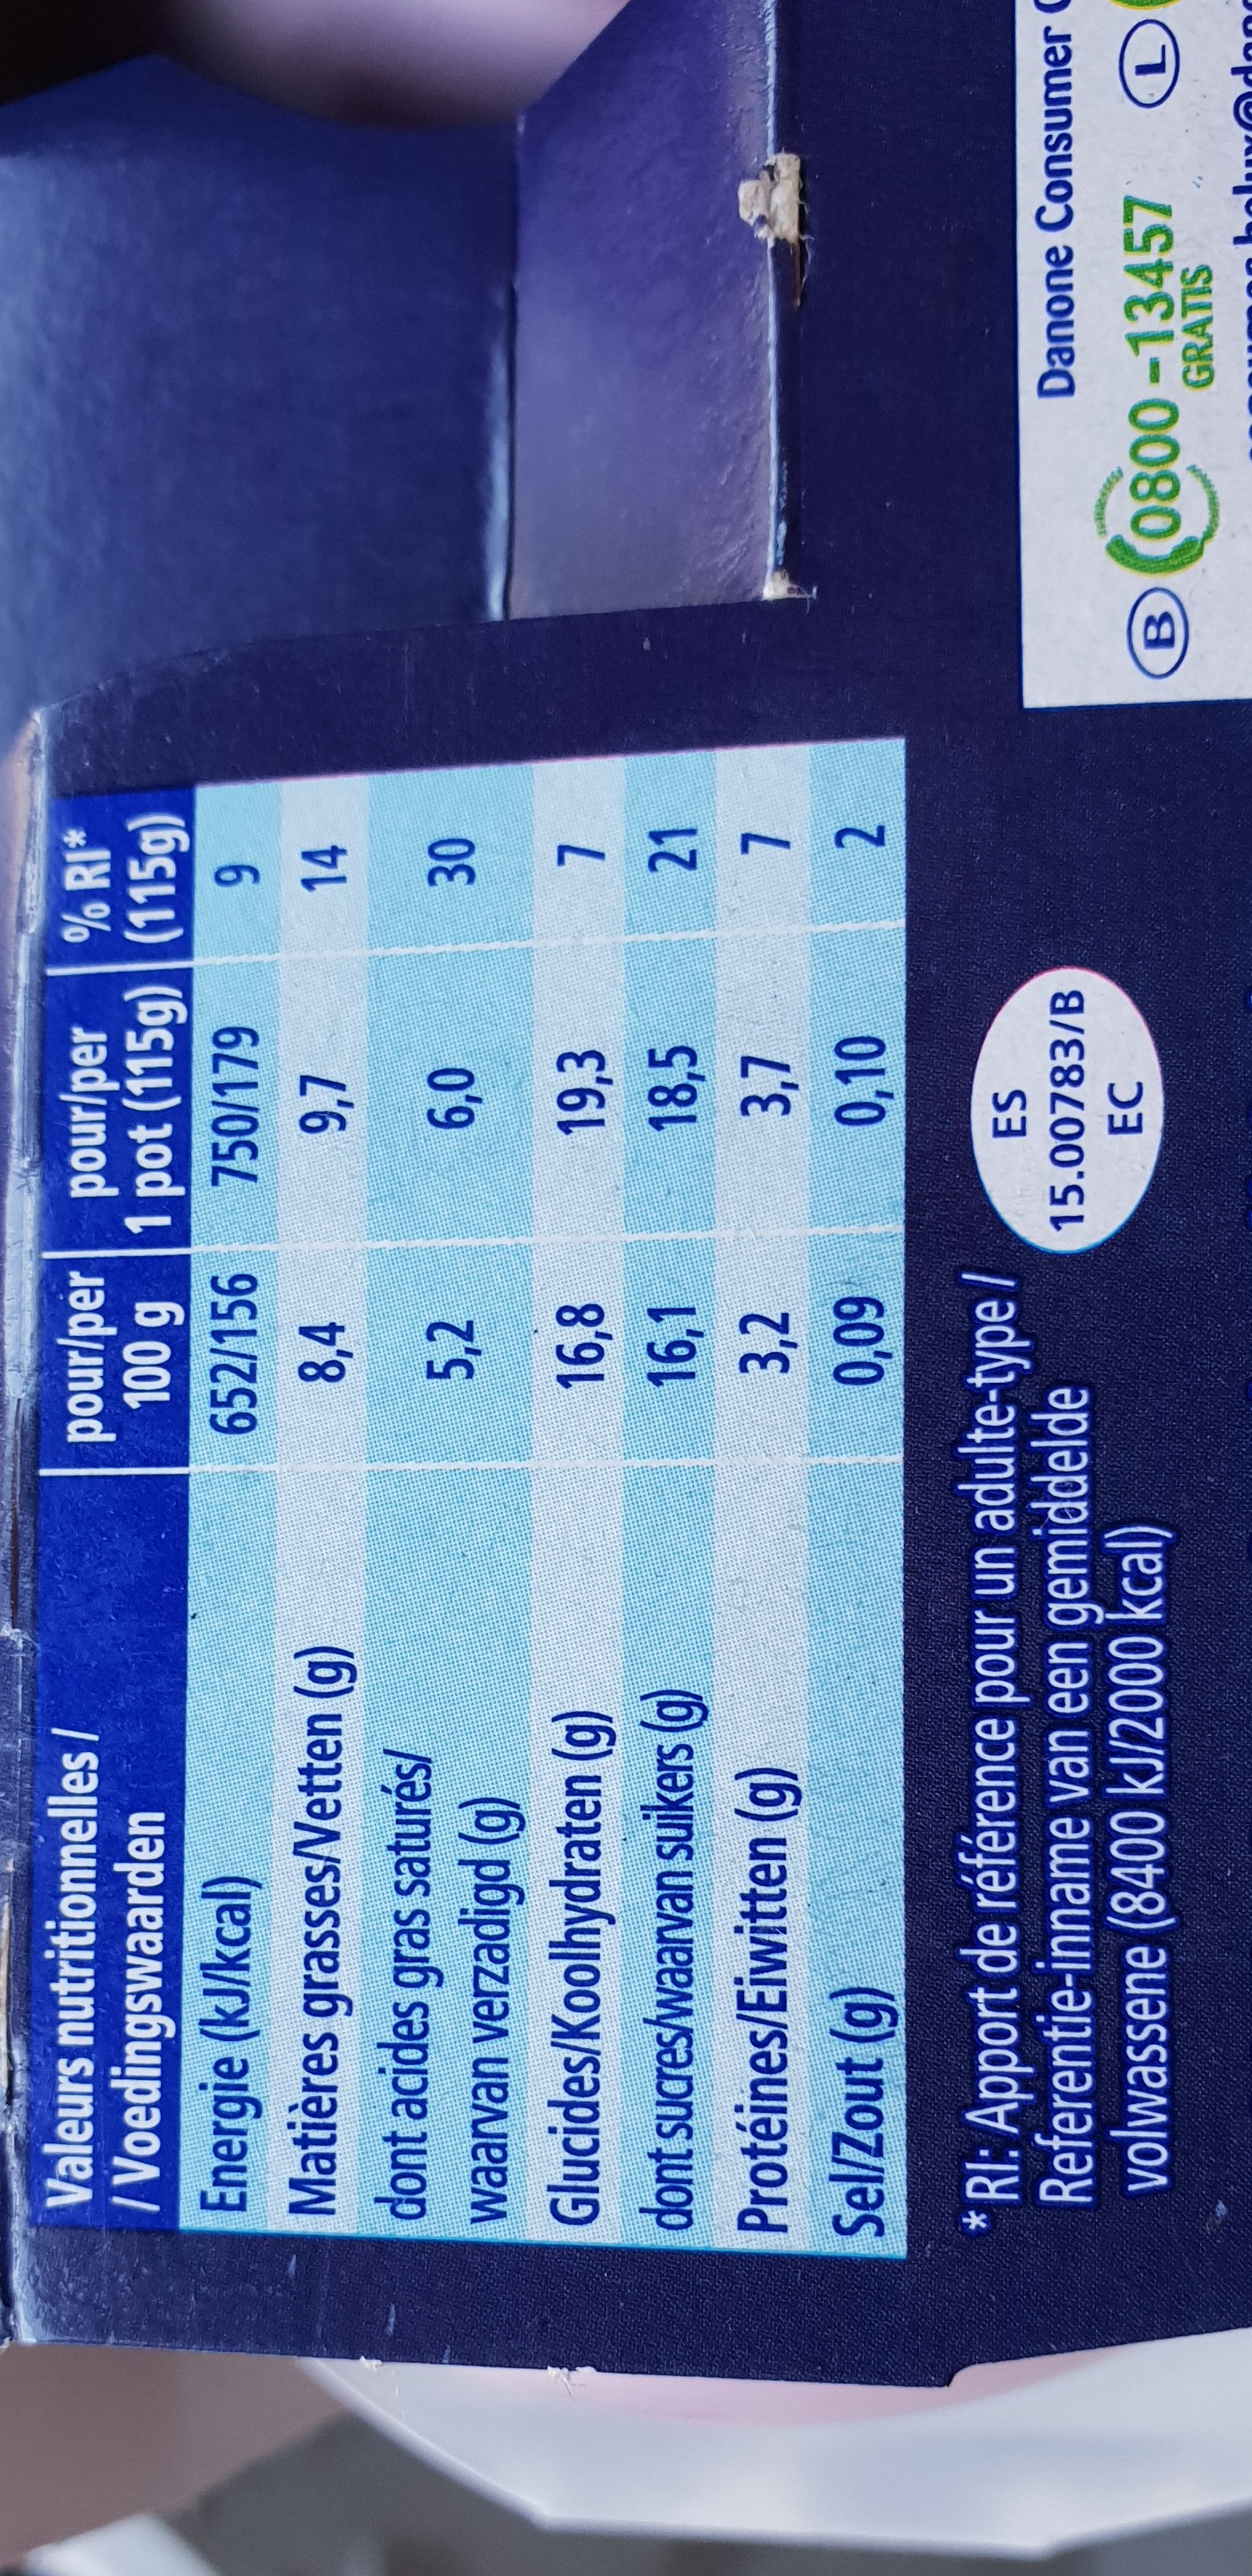 Yaourt à la grecque cheesecake myrtille - Voedingswaarden